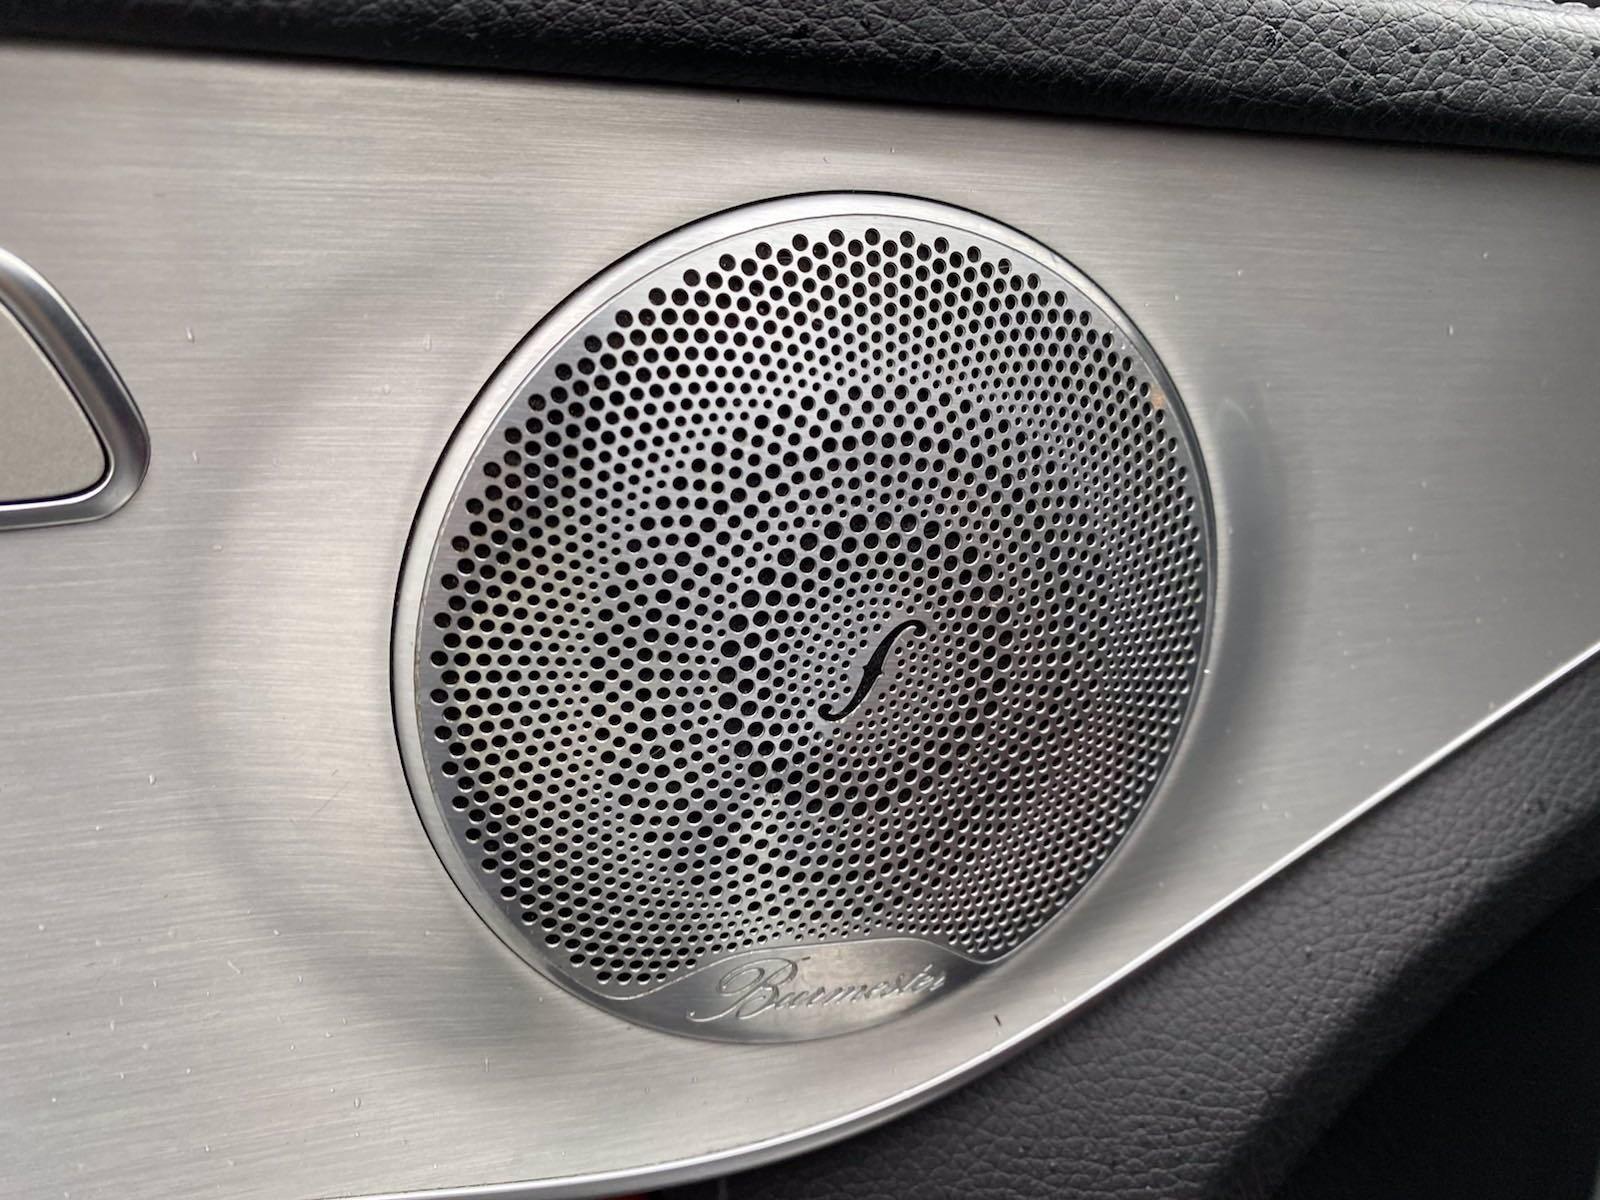 Used-2016-Mercedes-Benz-C-Class-C-450-AMG